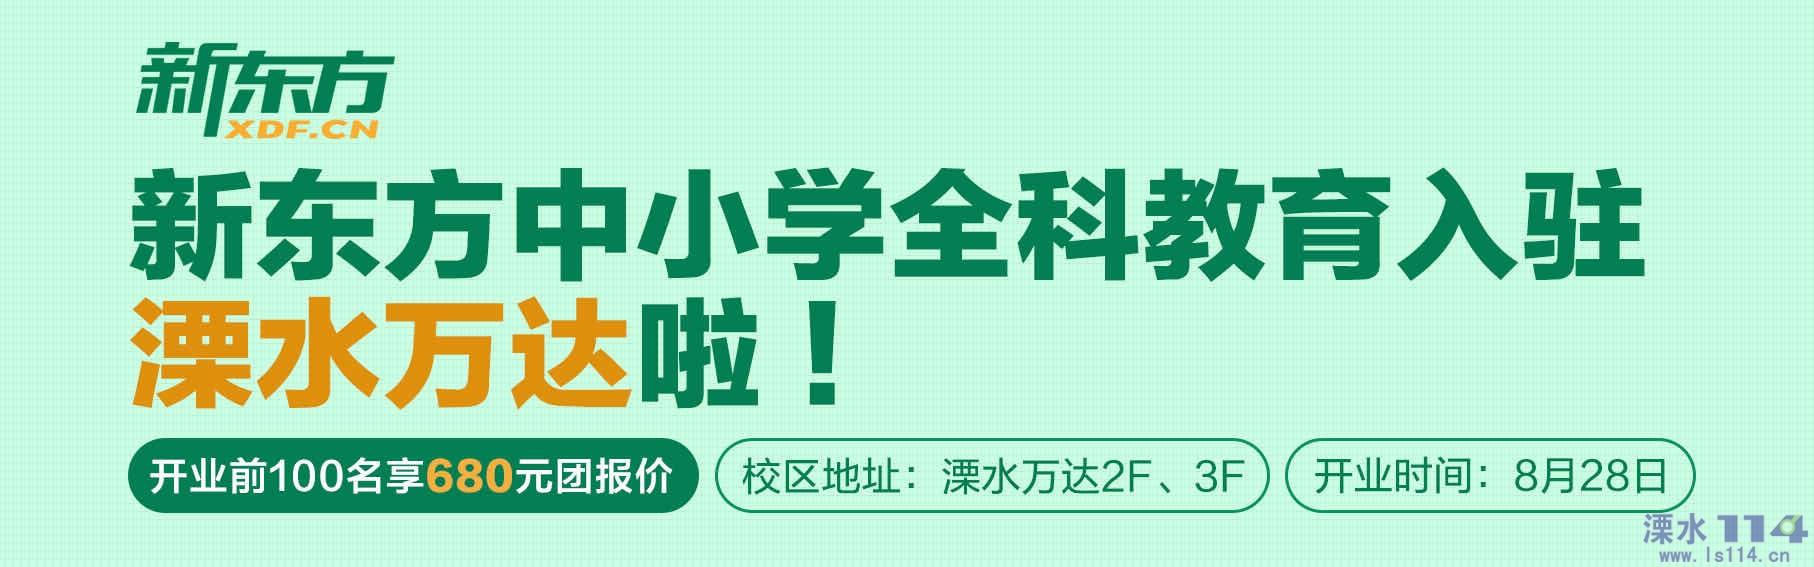 【�_�W季】新�|方入�v溧水,�_�I�F�笙��惠